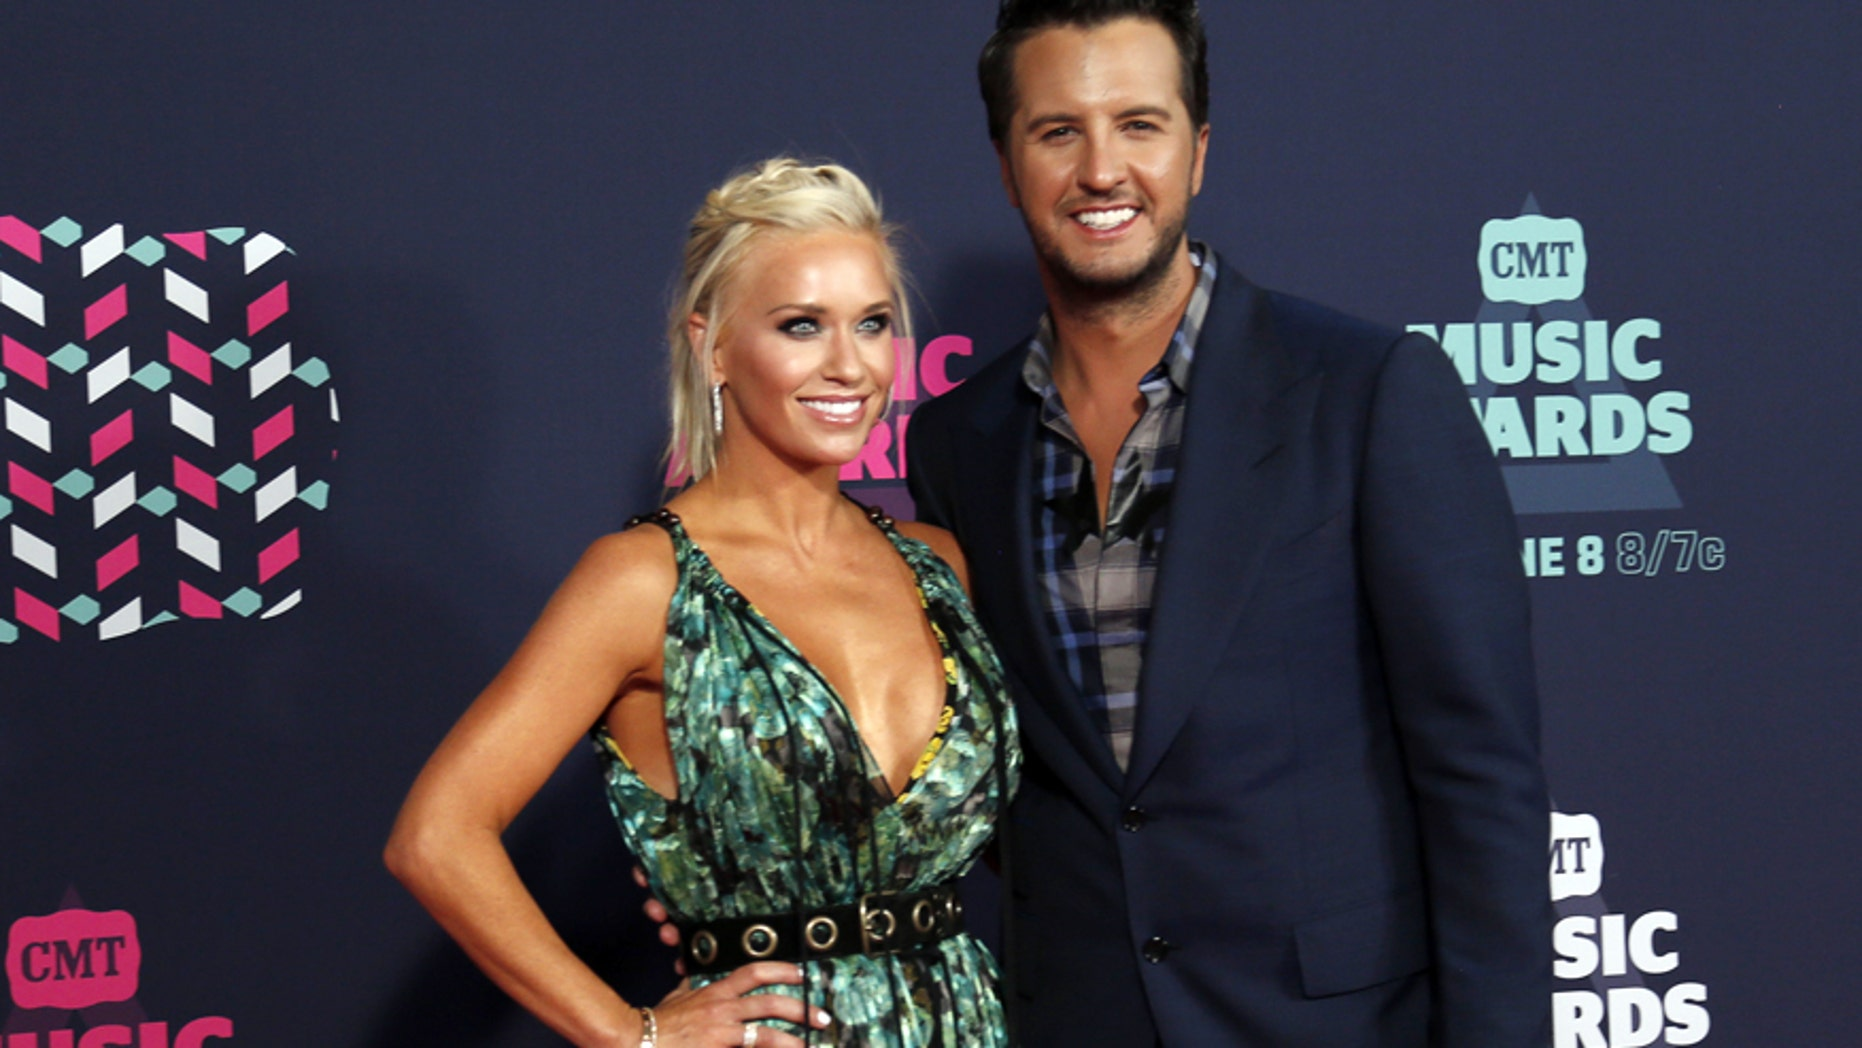 Singer Luke Bryan and wife, Caroline Boyer, arrive at the 2016 CMT Music Awards in Nashville, Tennessee, U.S. June 8, 2016.